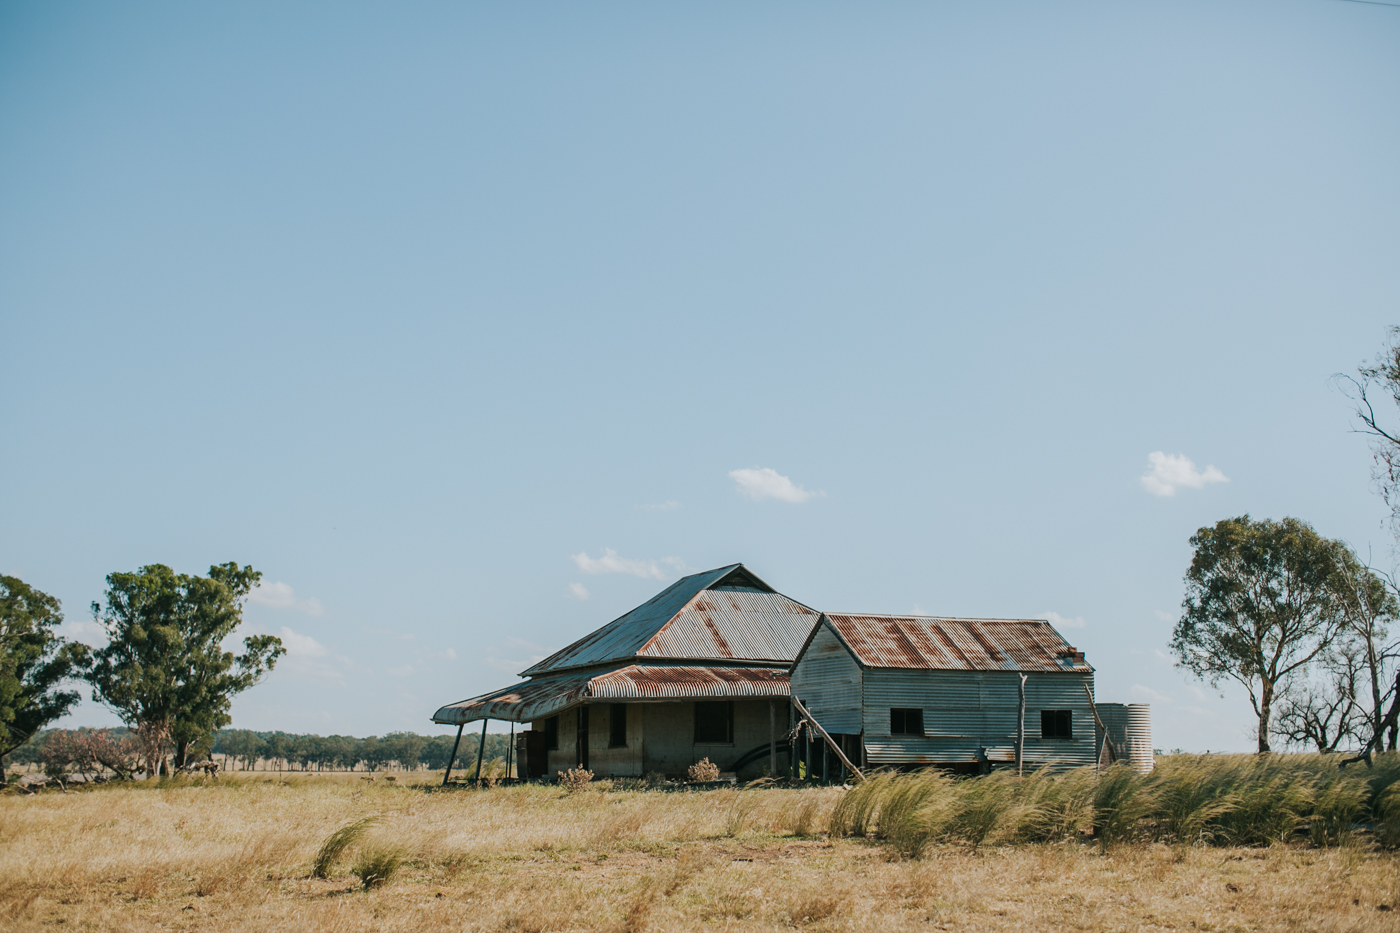 Nicolle & Jacob - Dubbo Wedding - Country Australia - Samantha Heather Photography-177.jpg